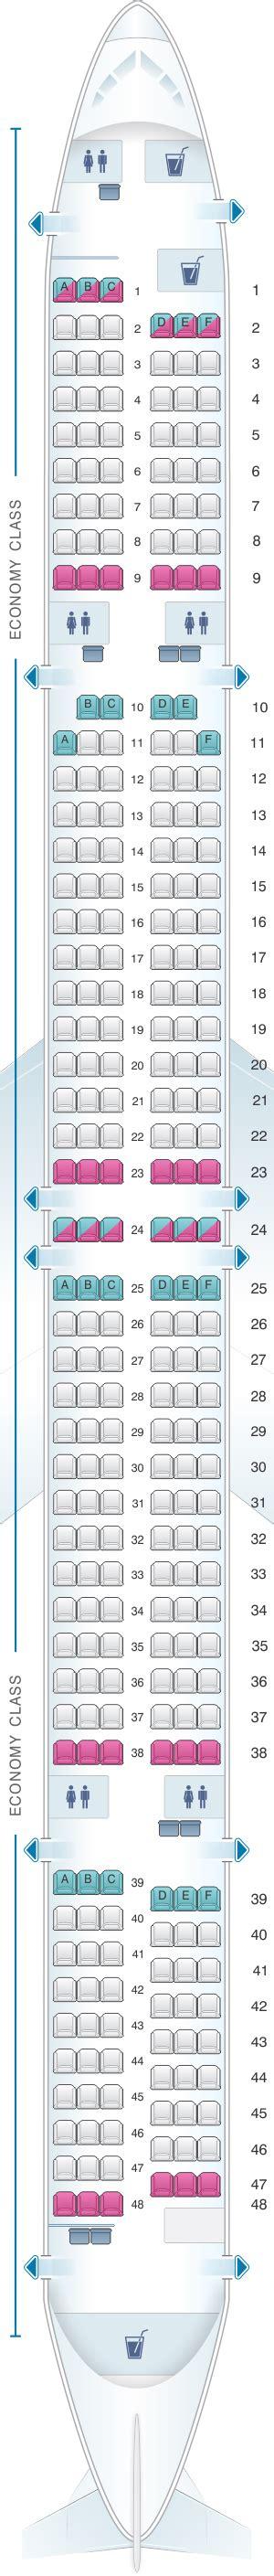 Thomas Cook Flight Seating Plan | Brokeasshome.com